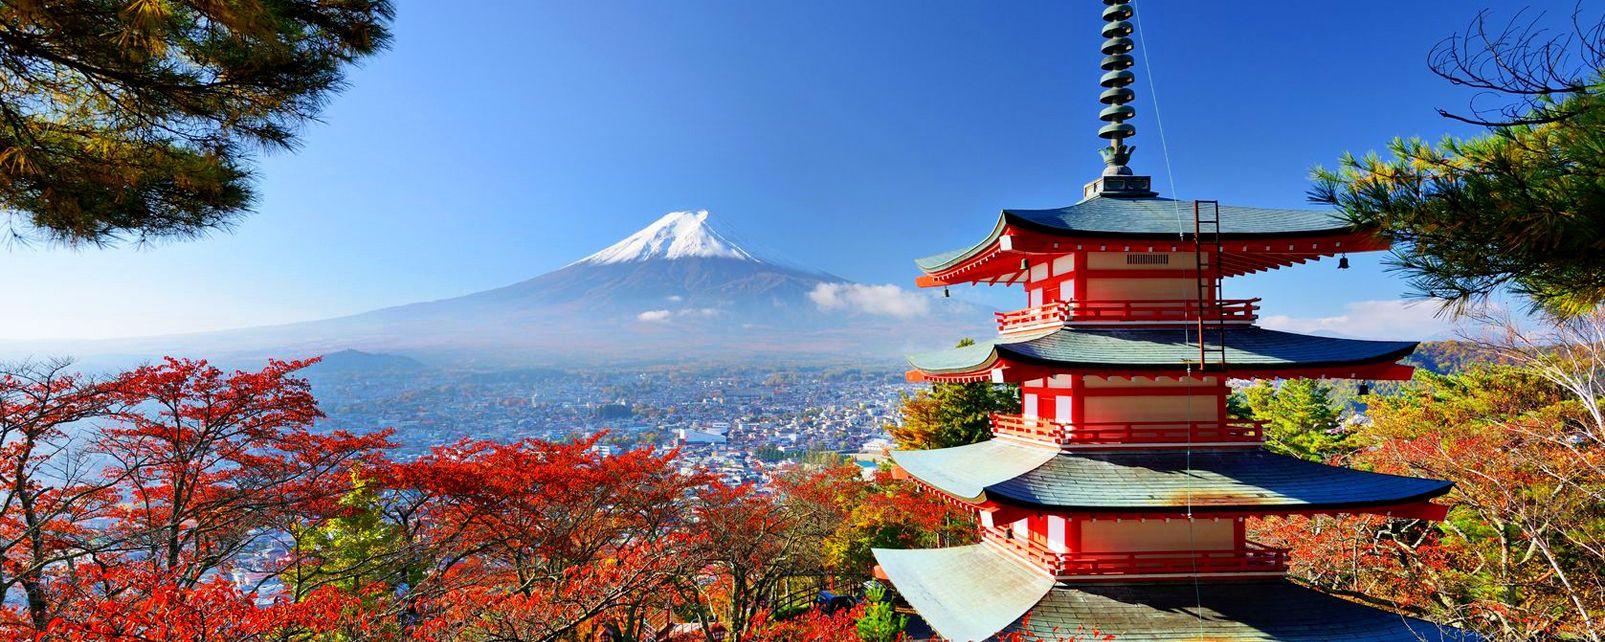 Mount Fuji , Mount Fuji, Japan , Japan